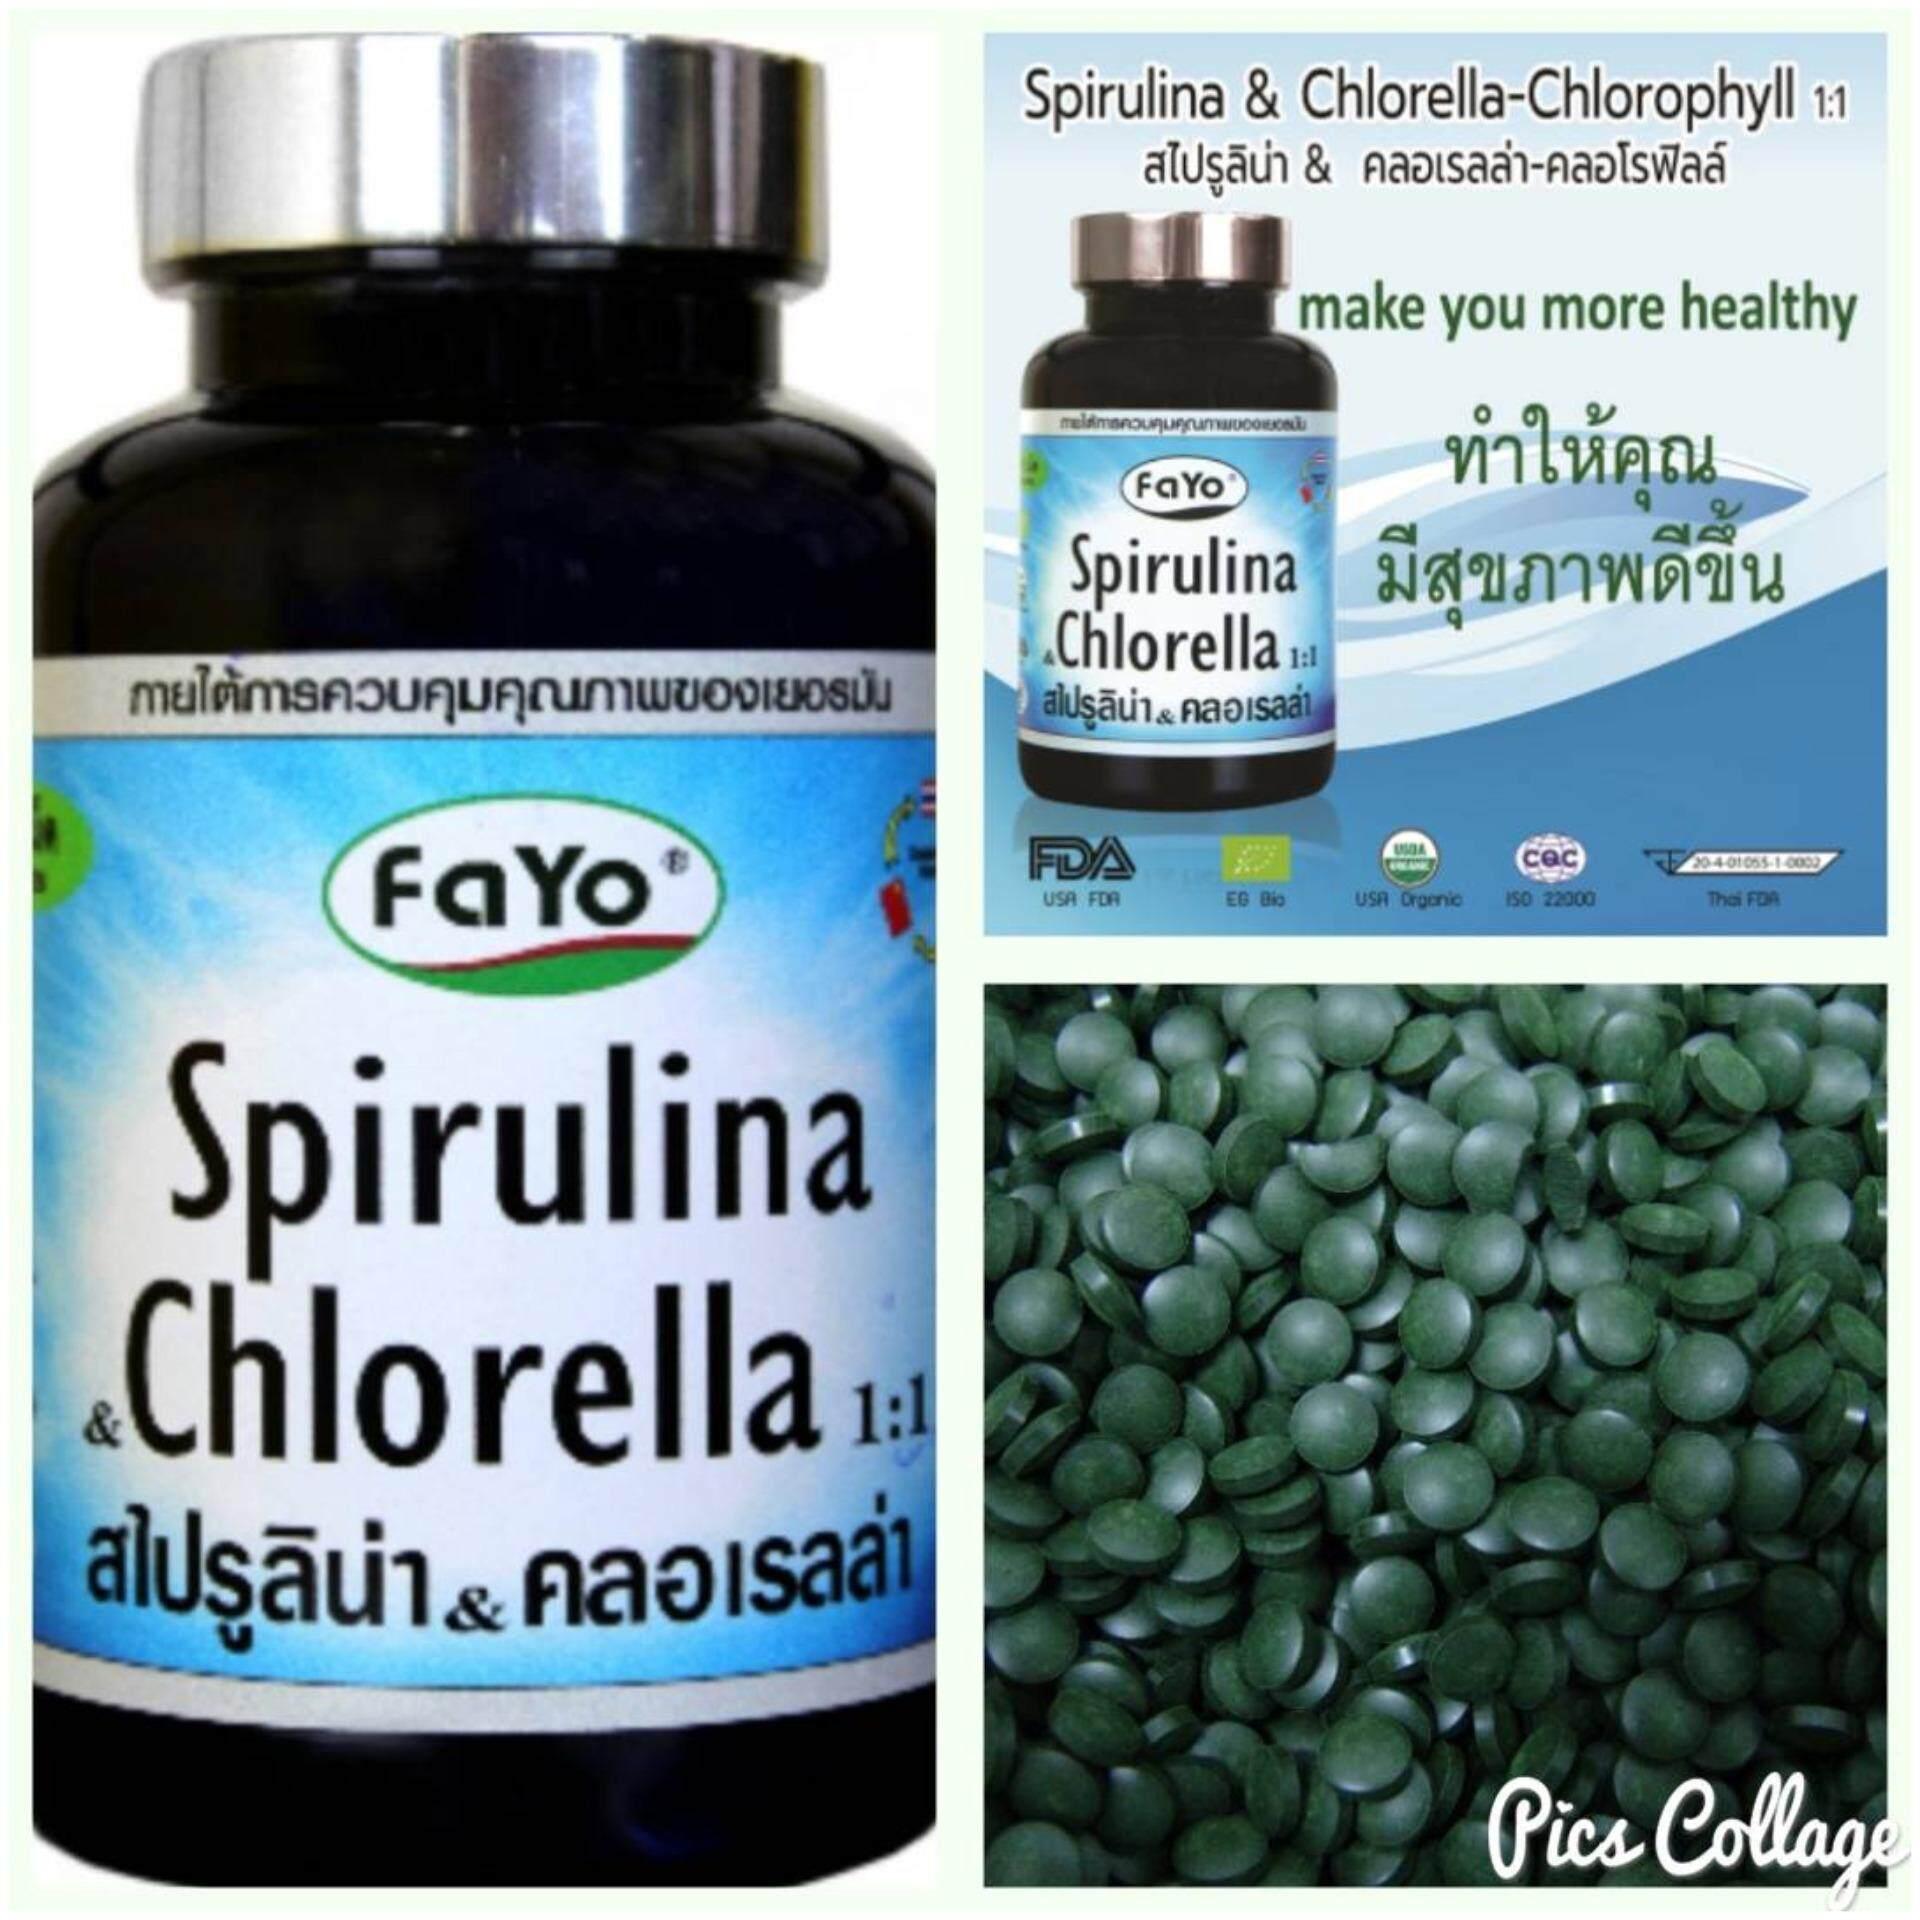 Spirulina Chlorella 200 เม็ด ขวด 1 ขวด 400 มก เม็ด ผสม 50 50 Fayo Brand ใหม่ล่าสุด